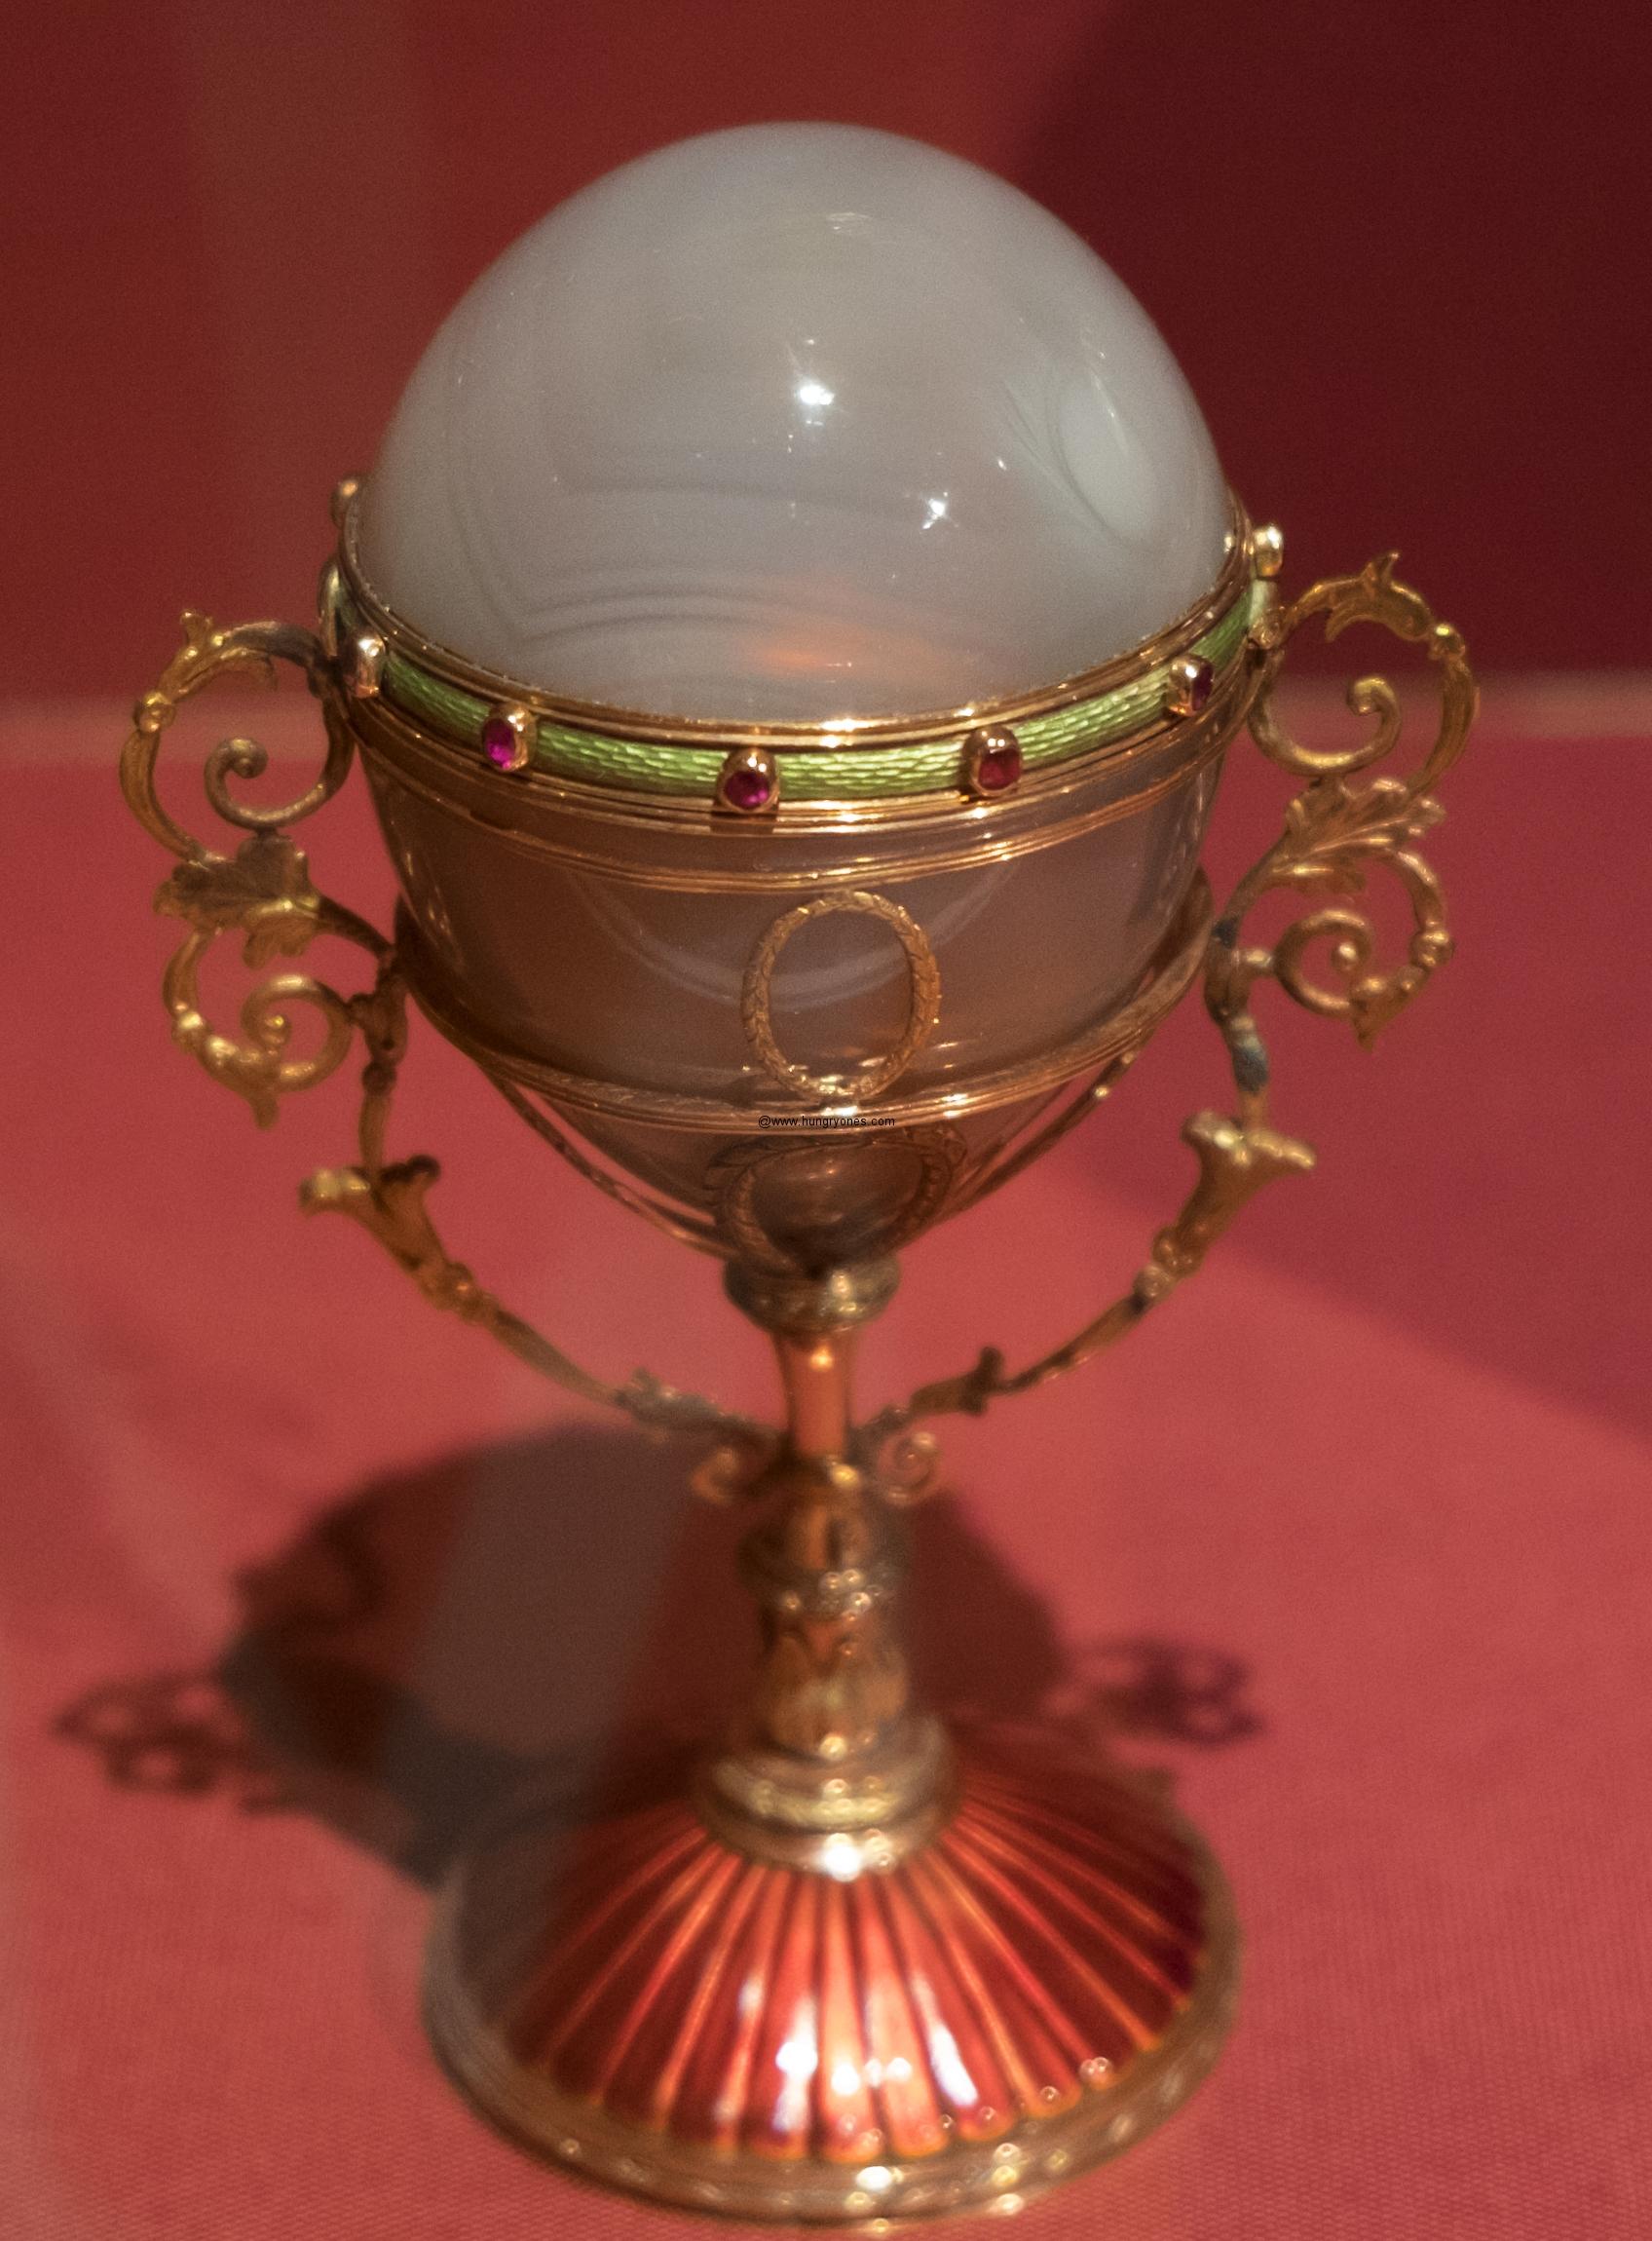 Oviform Perfume Flacon House of Faberge' Russian Saint Petersburg 1899-1908